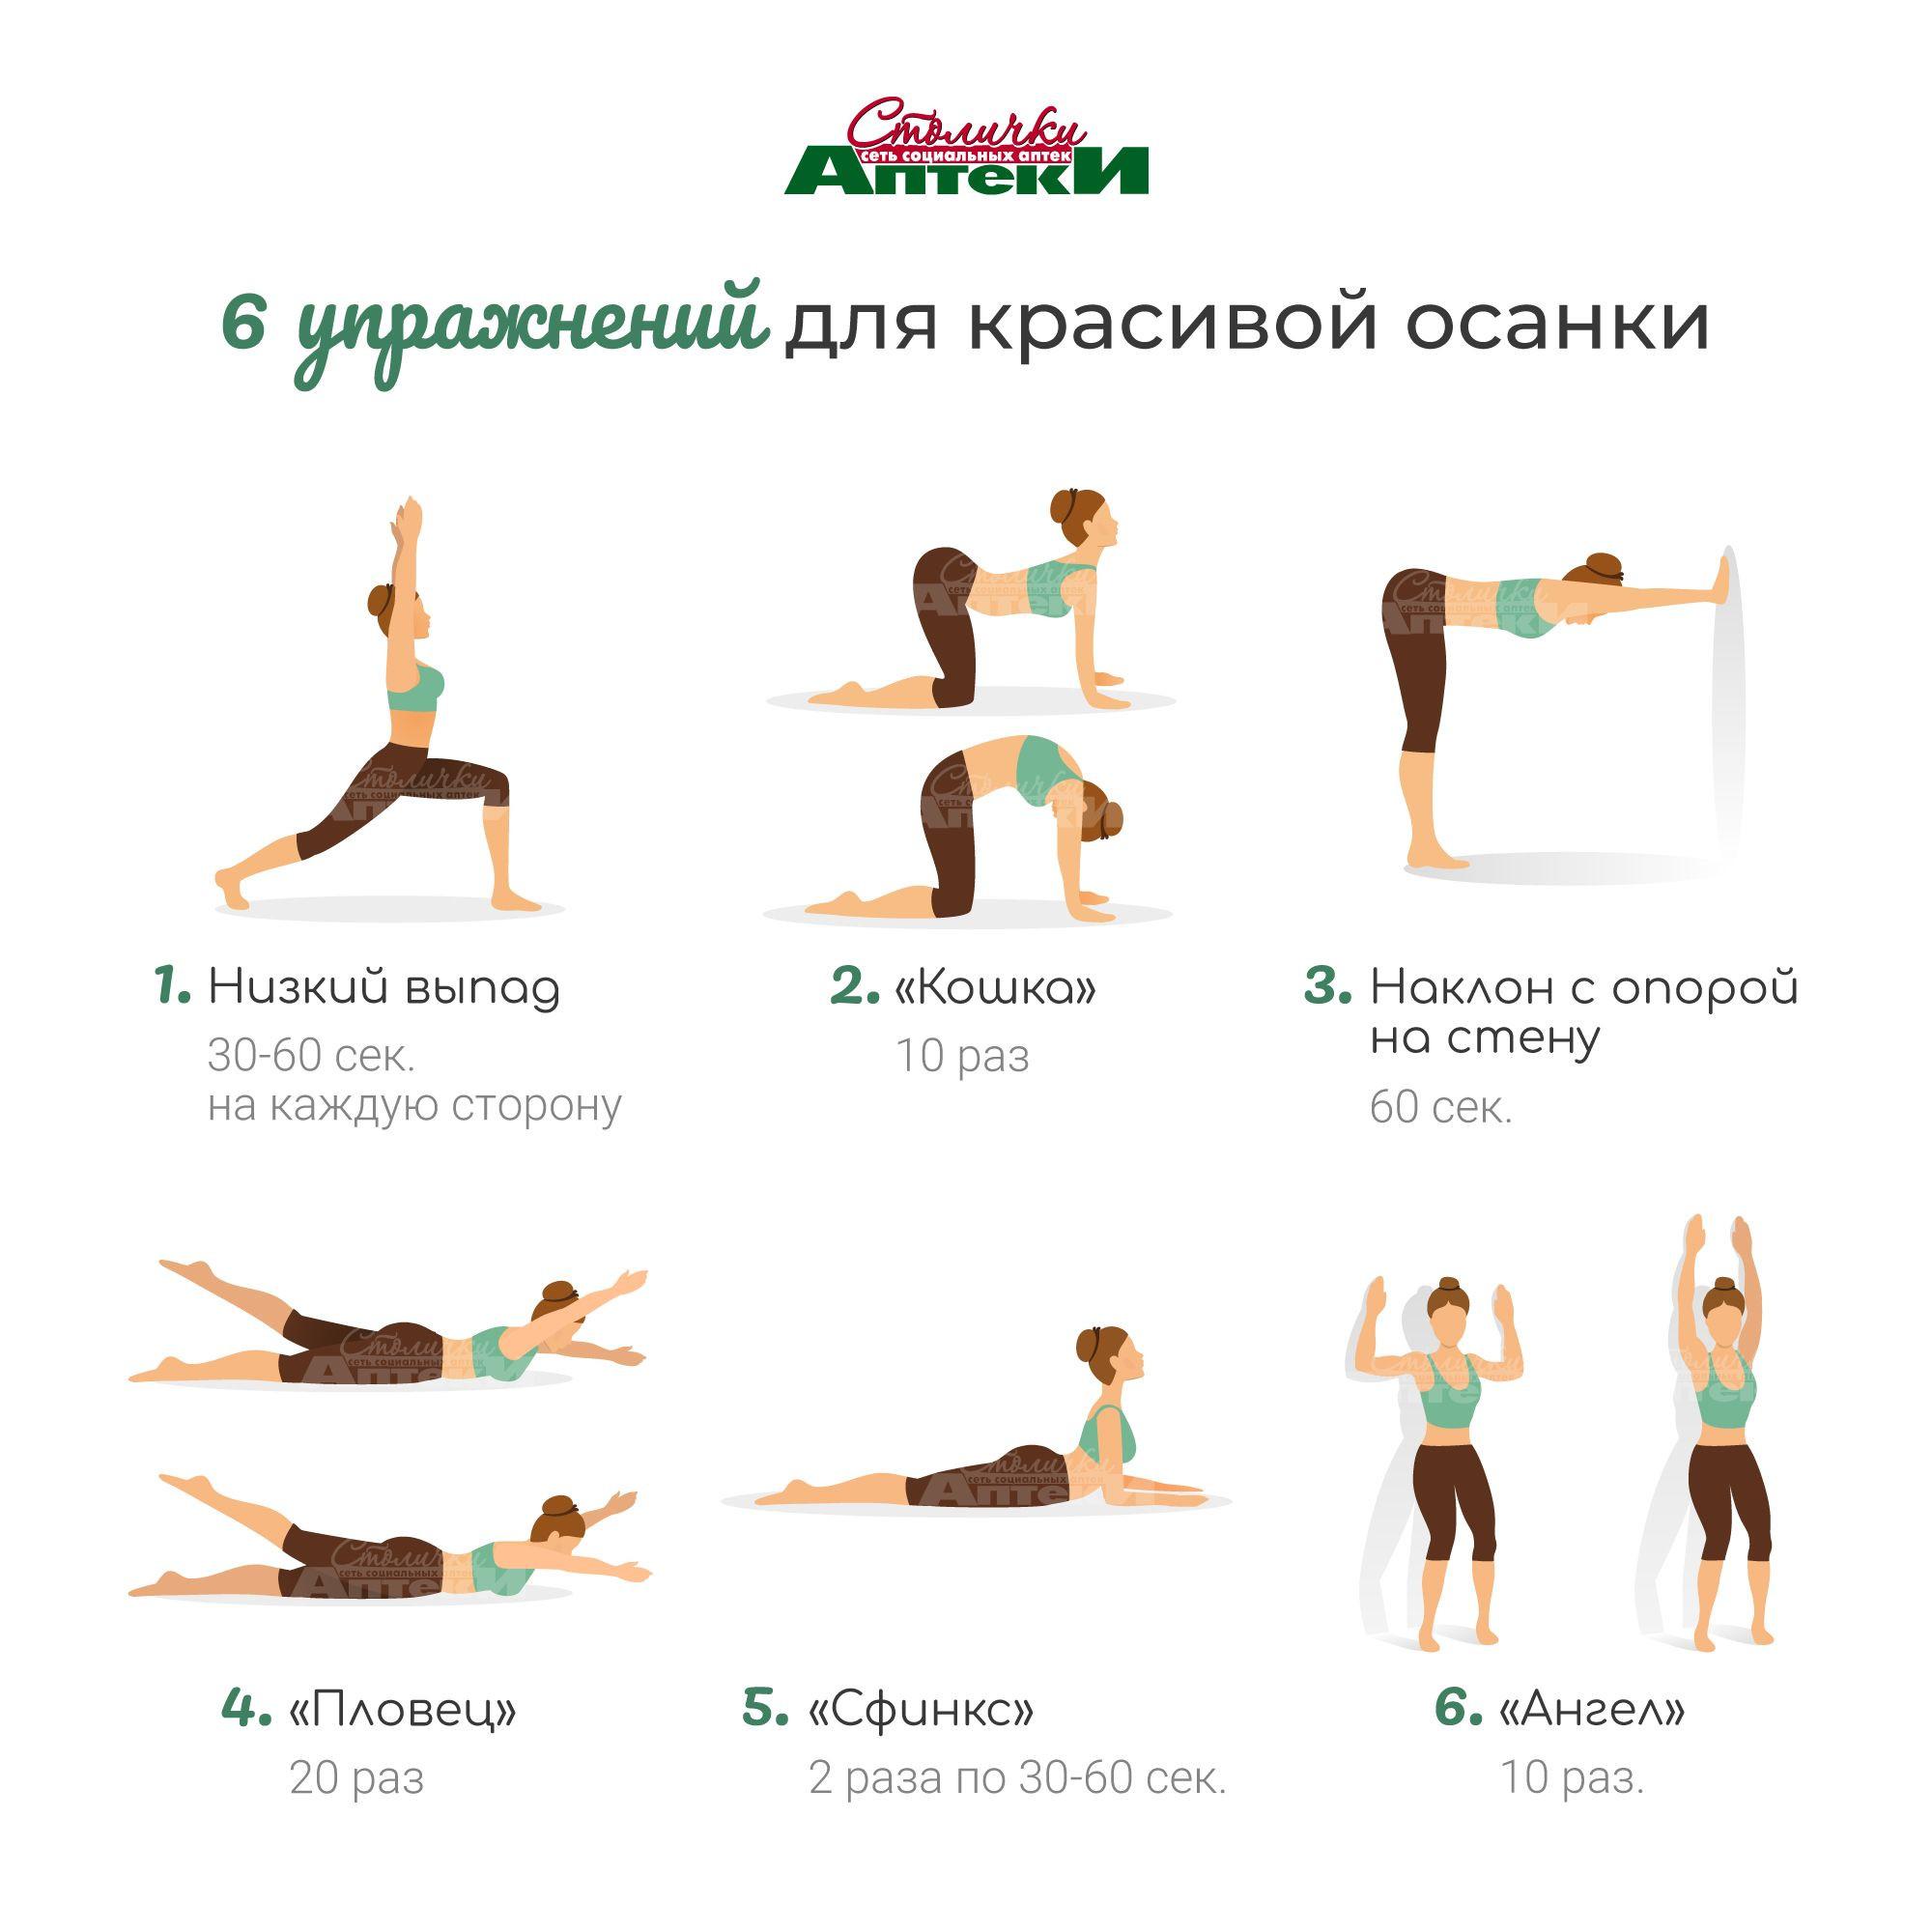 6 упражнений для красивой осанки